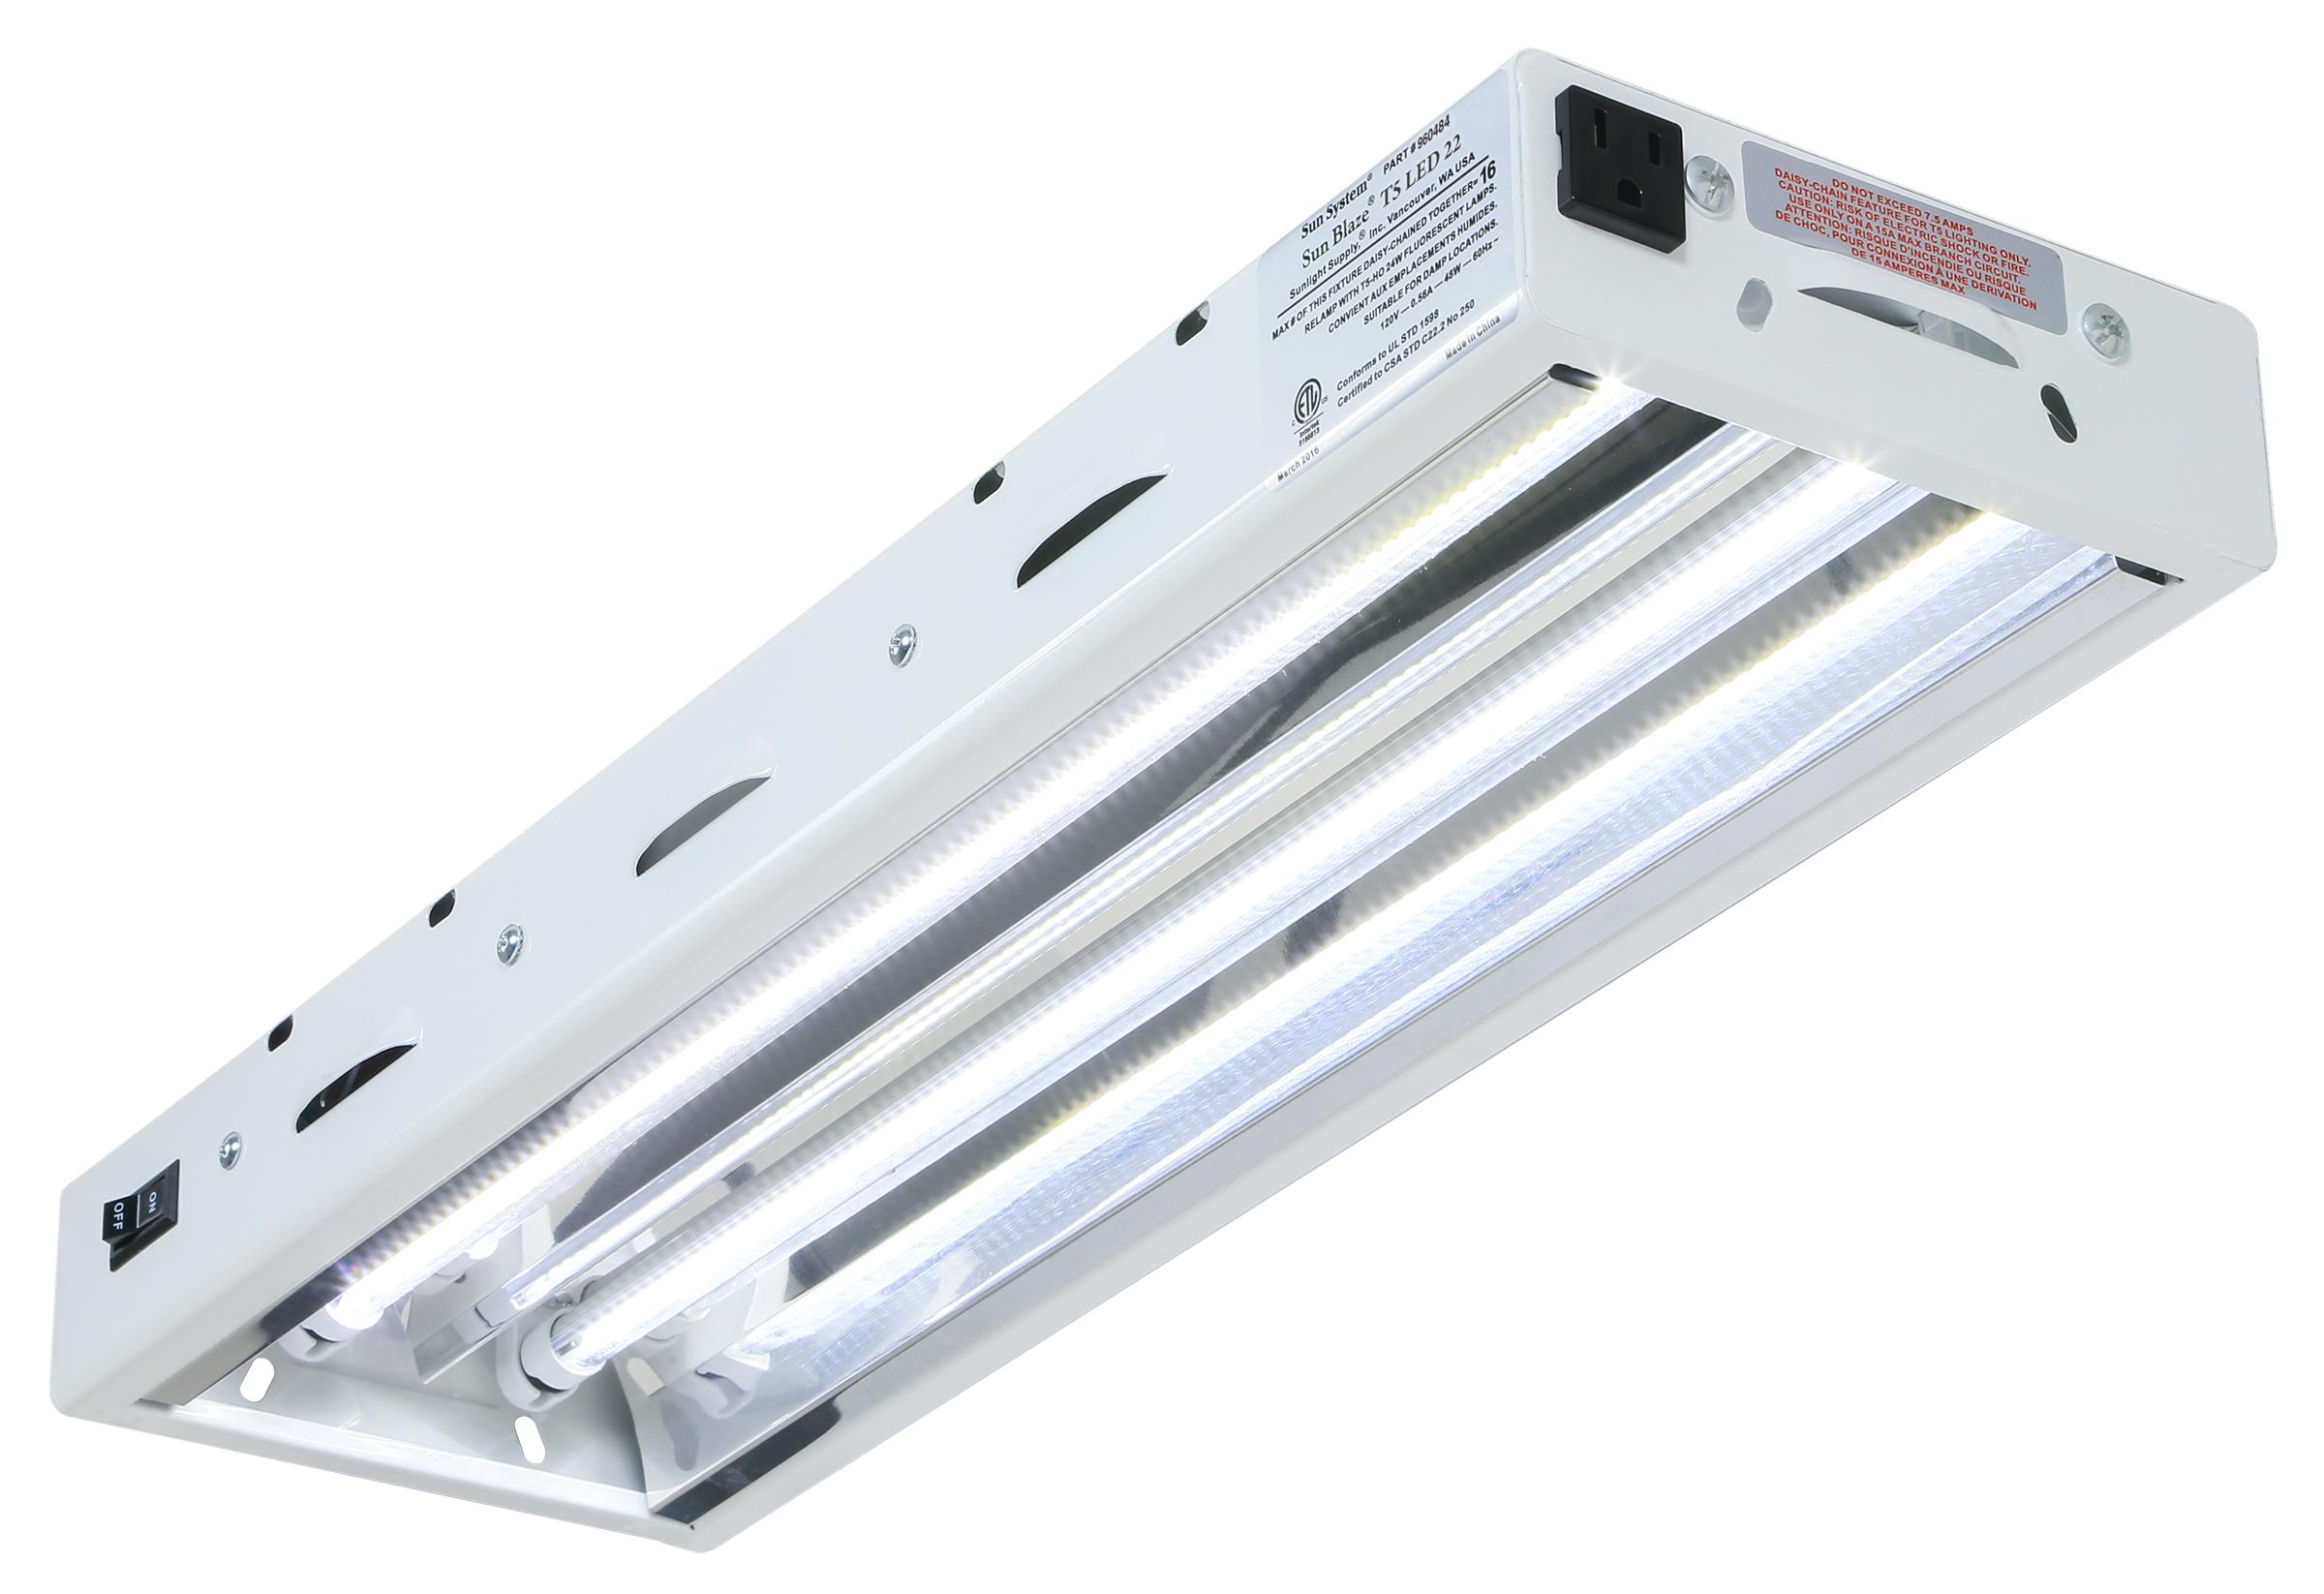 lightbox  sc 1 st  Goldleaf Hydroponics & Sun Blaze T5 LED 22 - 2 ft 2 Lamp 120 Volt - Goldleaf Hydro